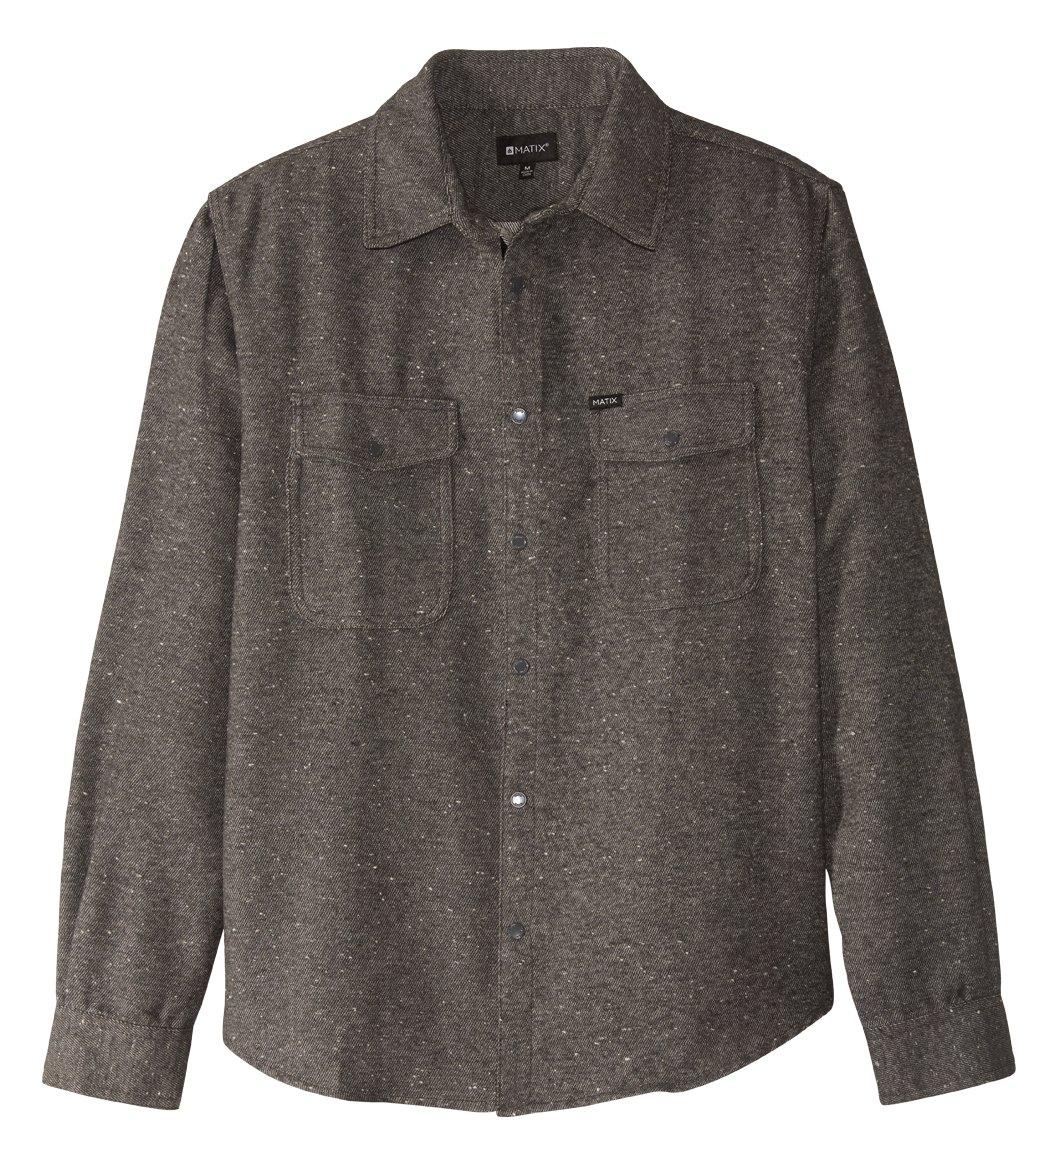 Matix Men's Mendocino Long Sleeve Overshirt at SwimOutlet.com - Free  Shipping